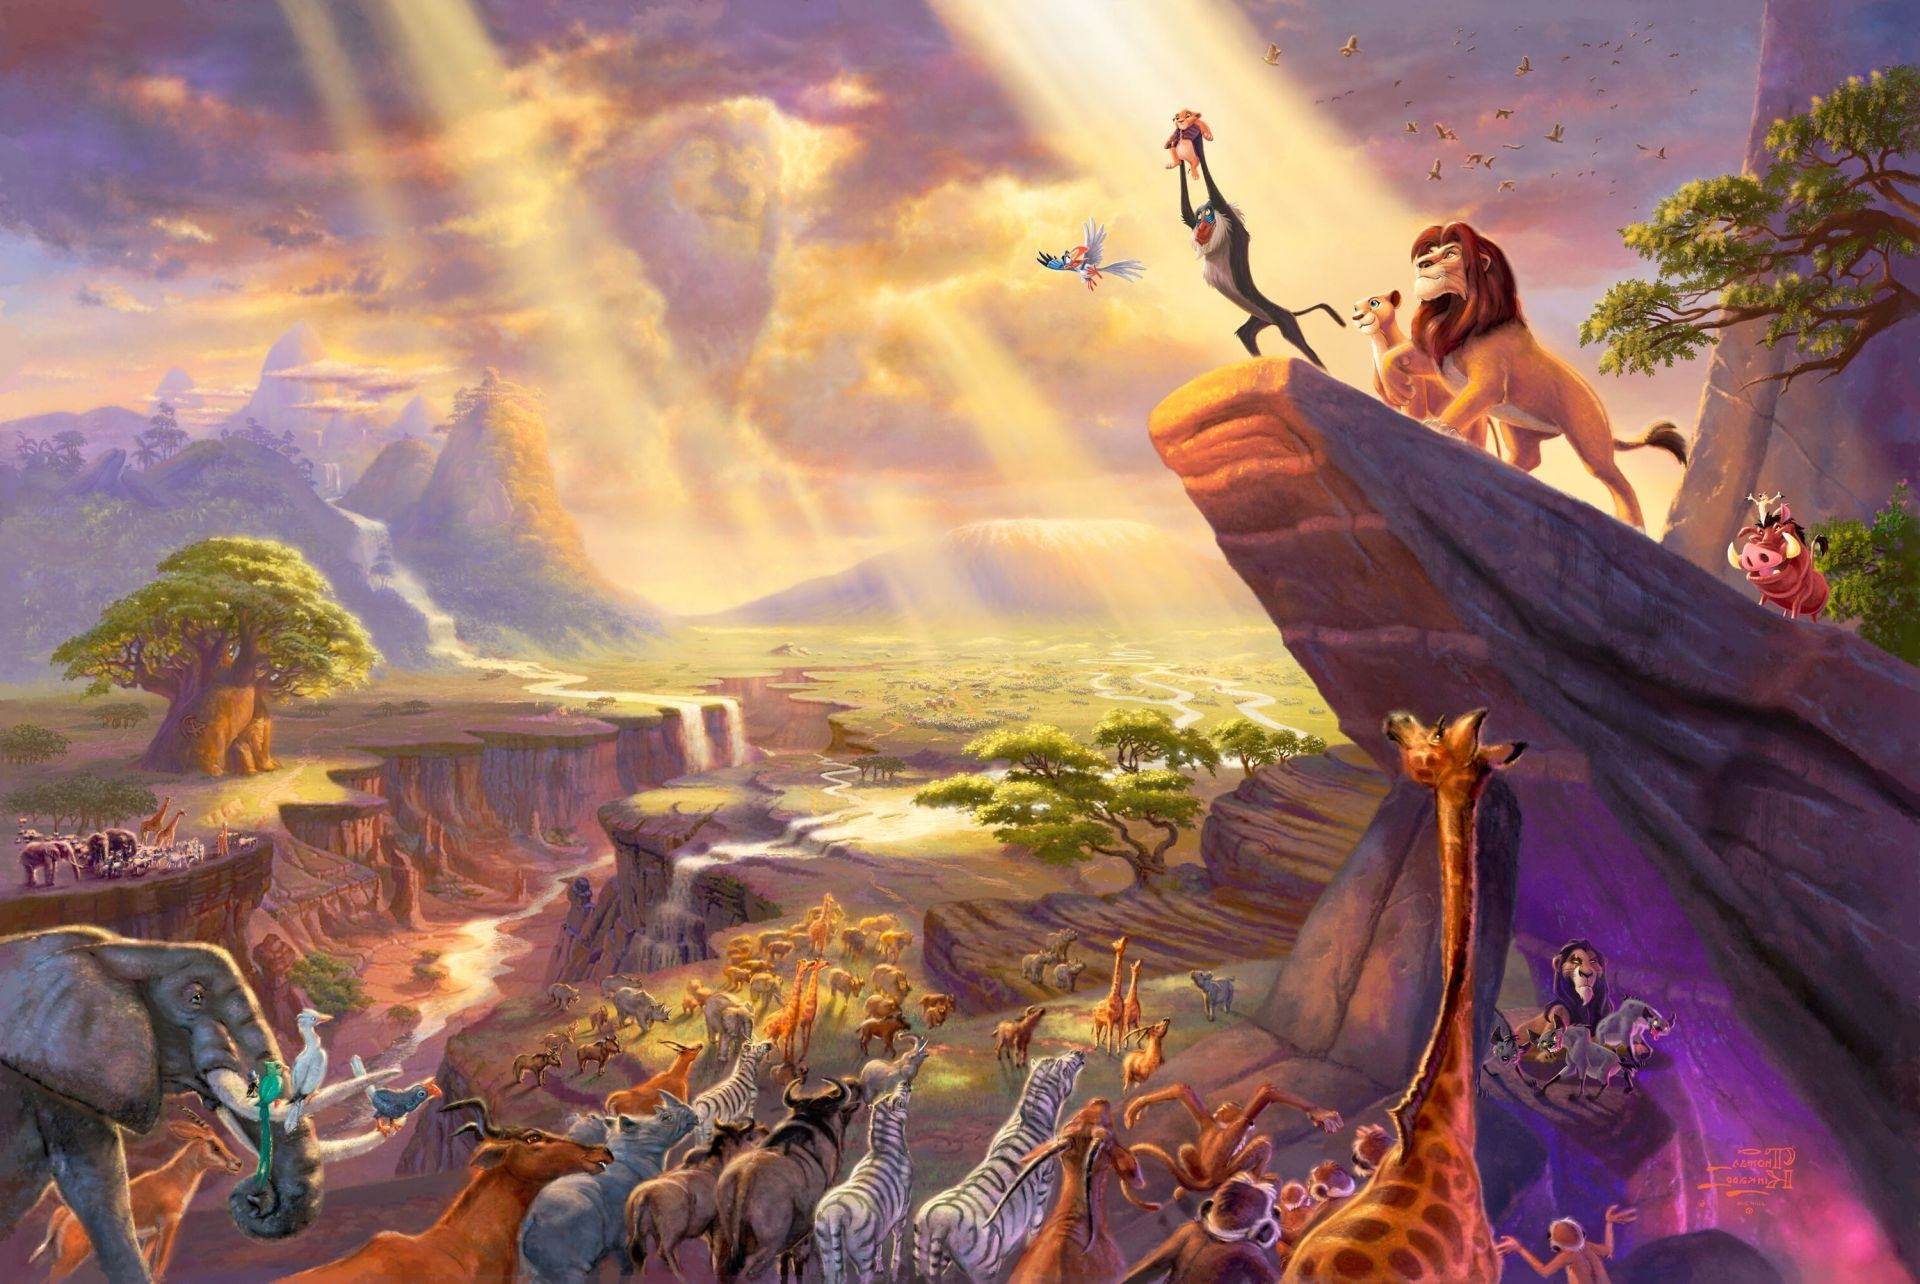 The Lion King Thomas Kinkade The Lion King Painting Paintin Iphone